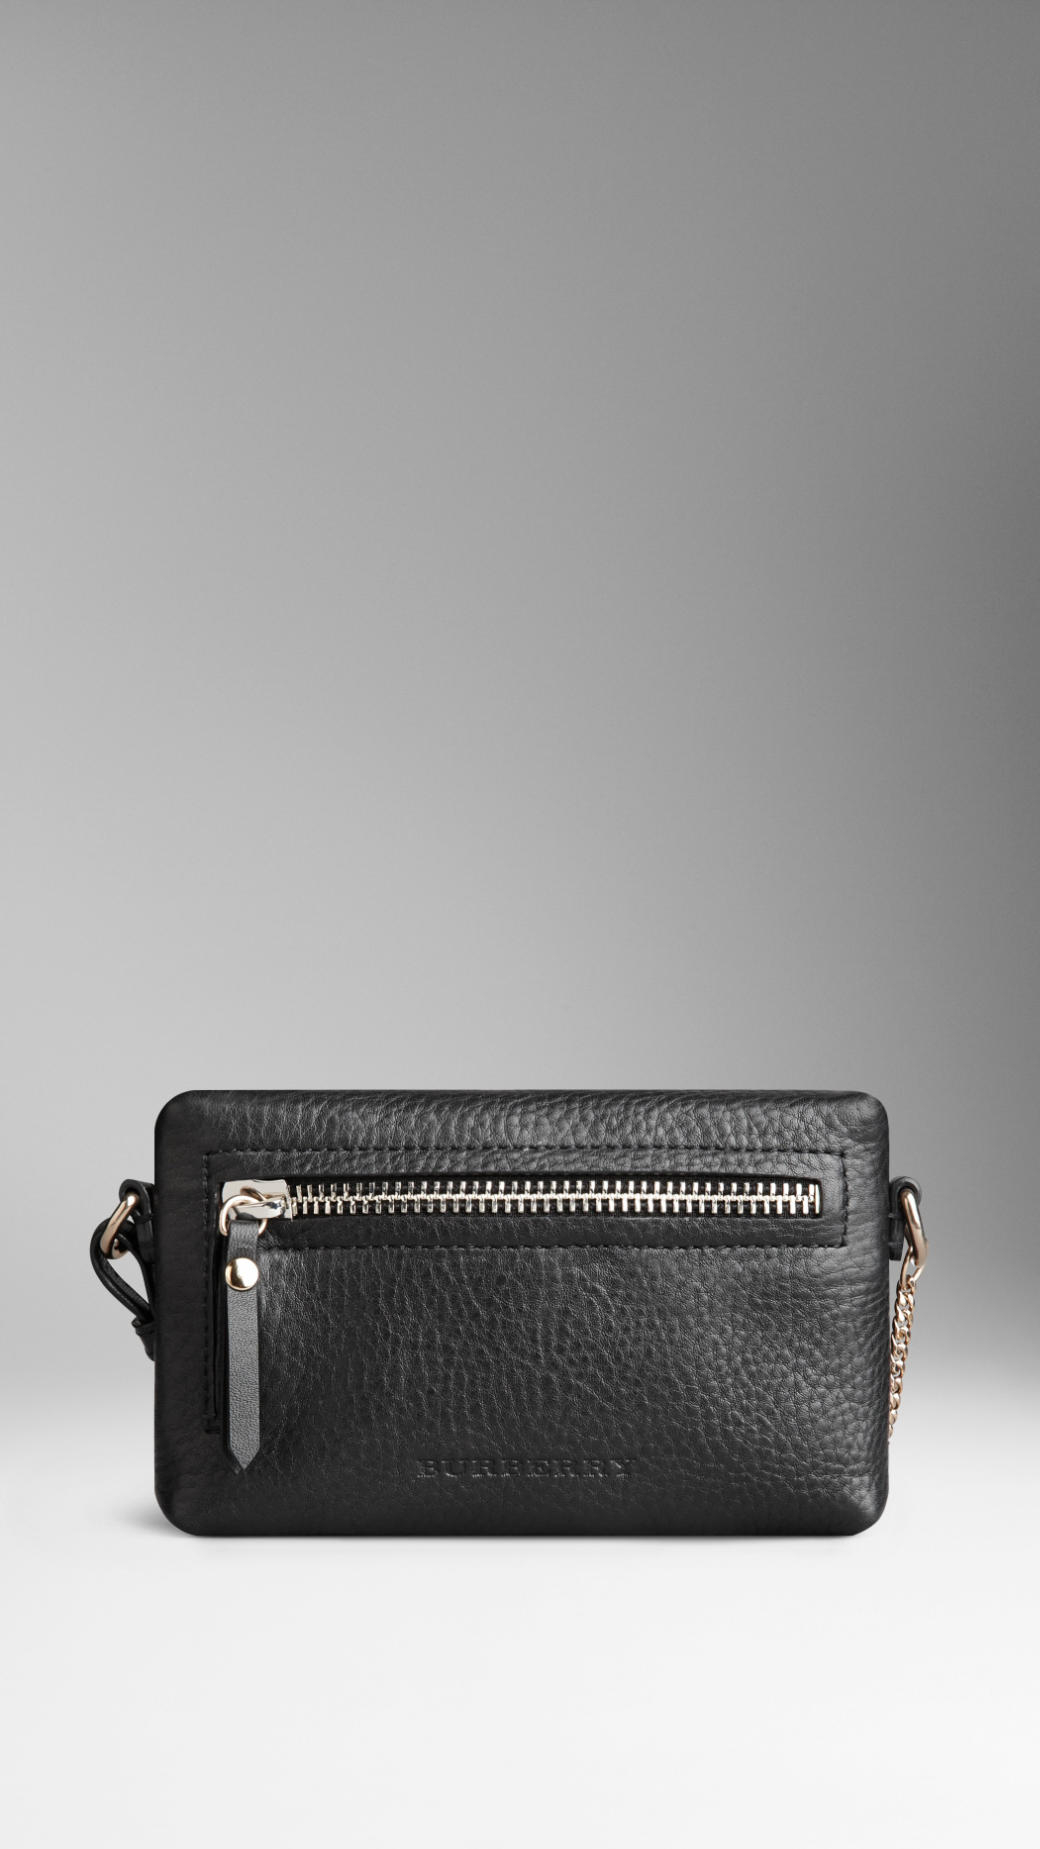 49595875e697 Lyst - Burberry Mini Grainy Leather Crossbody Bag in Black